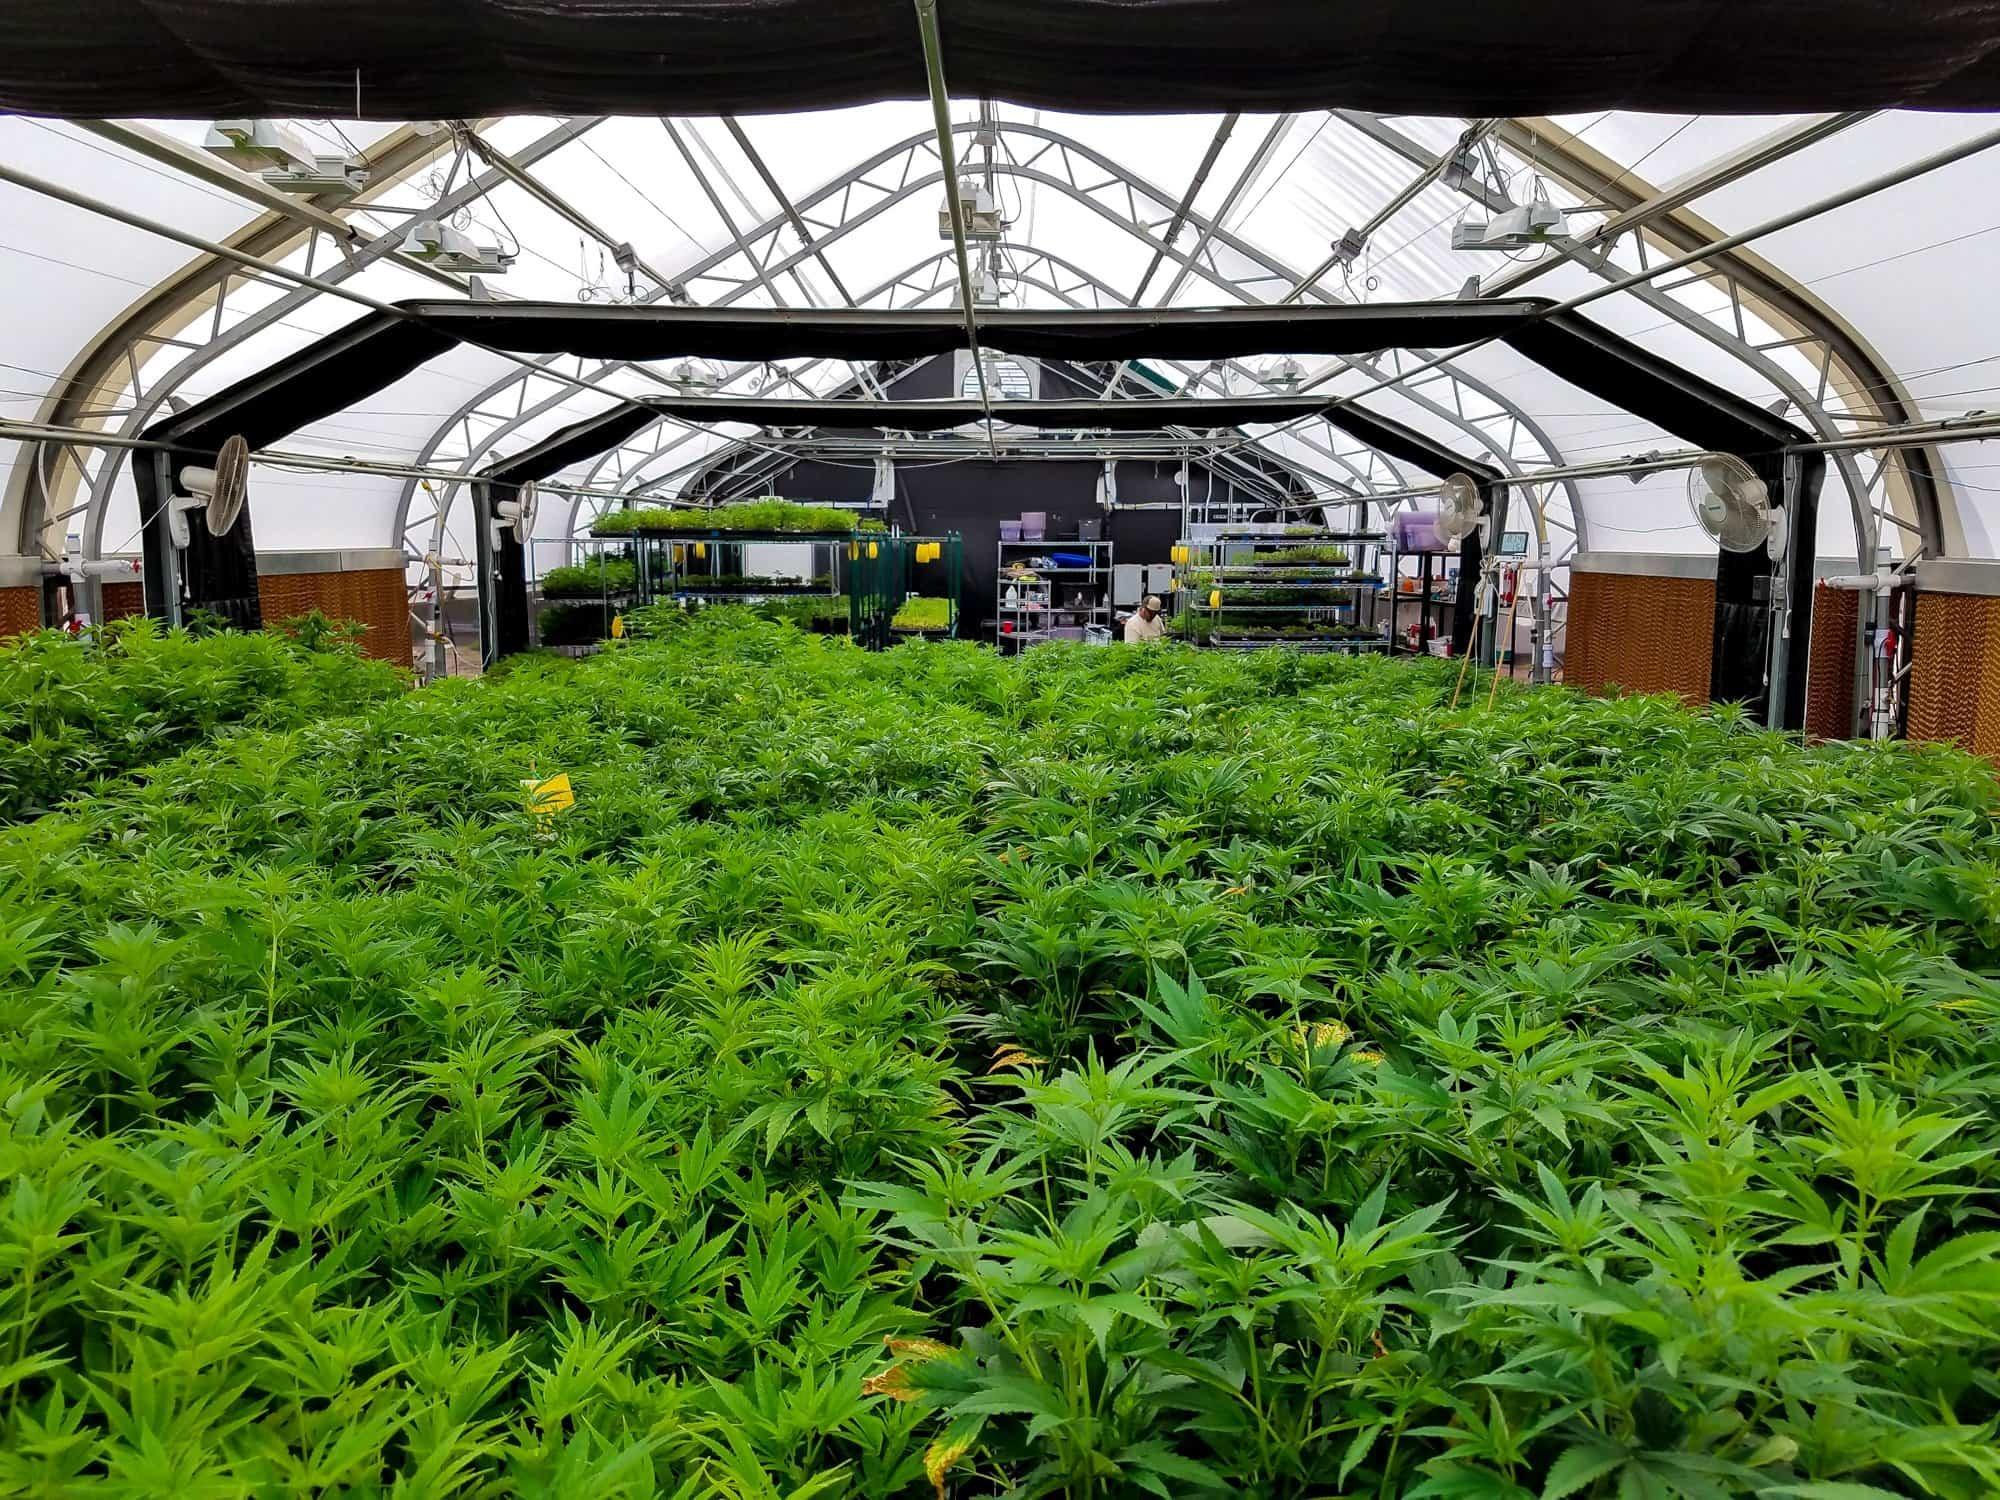 About Veritas Farms: A Full Spectrum Hemp Farm in Pueblo